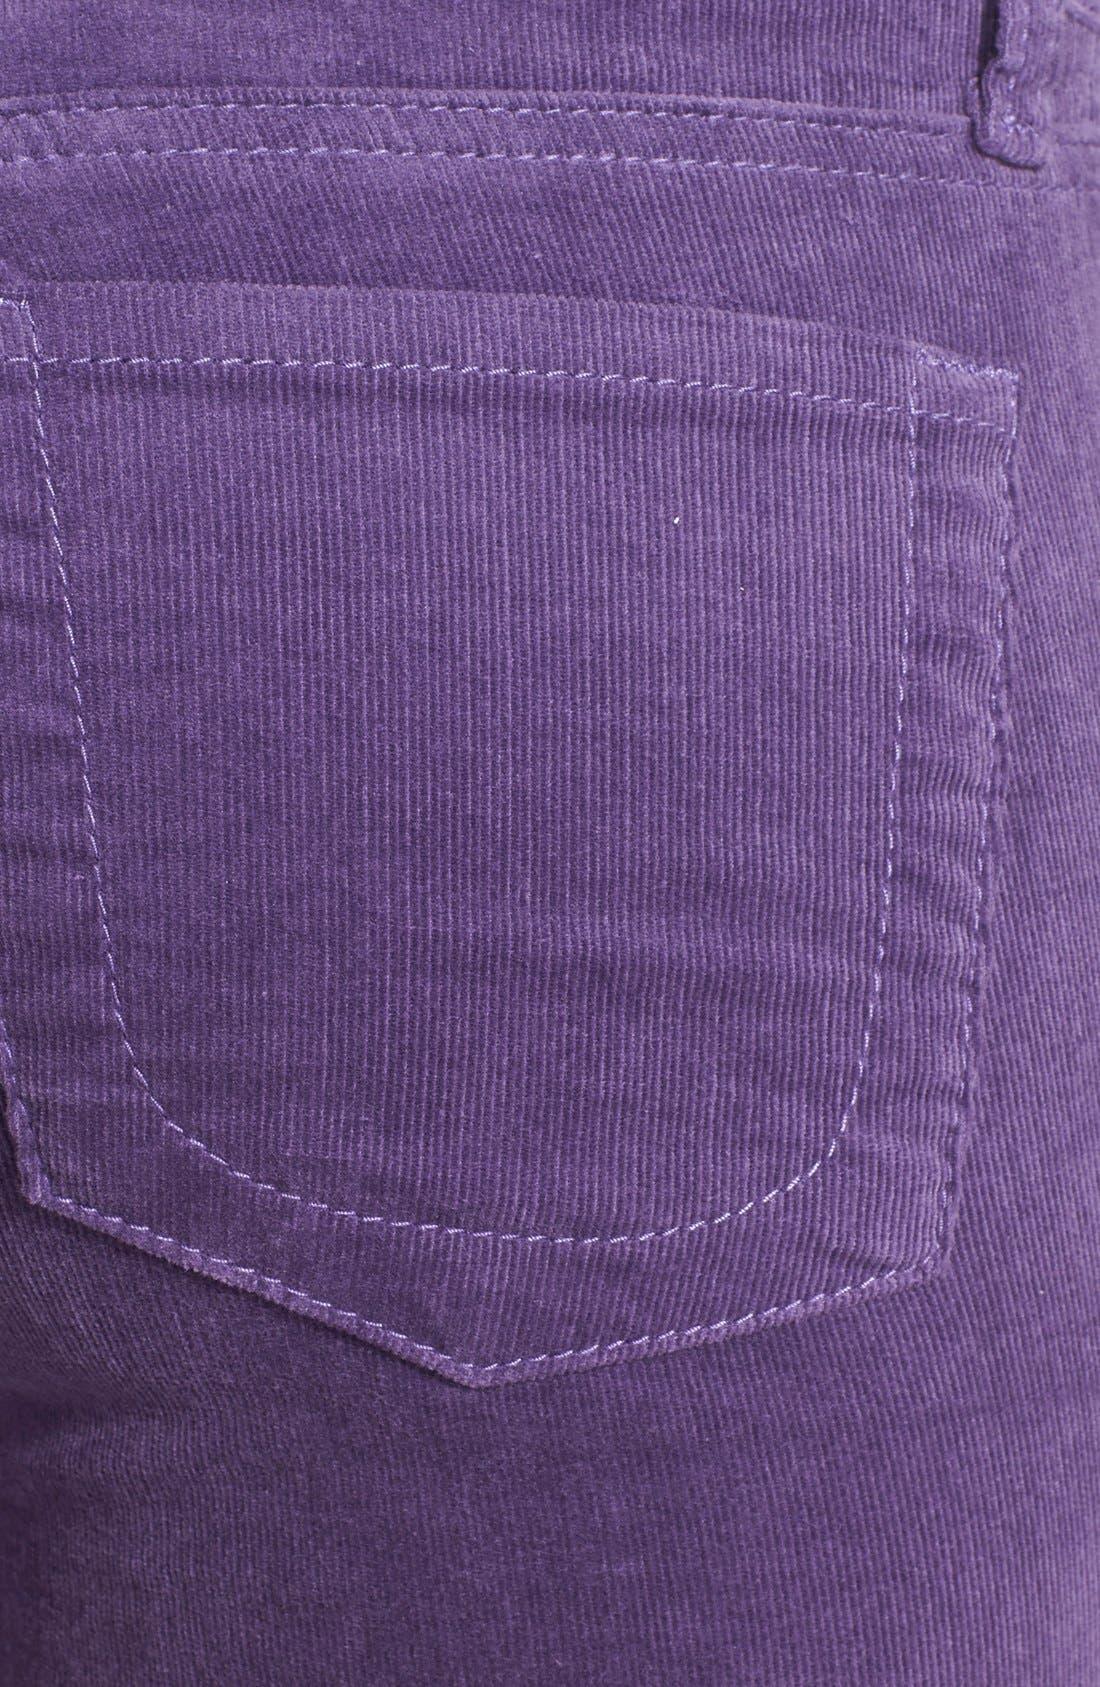 'Diana' Stretch Corduroy Skinny Pants,                             Alternate thumbnail 142, color,